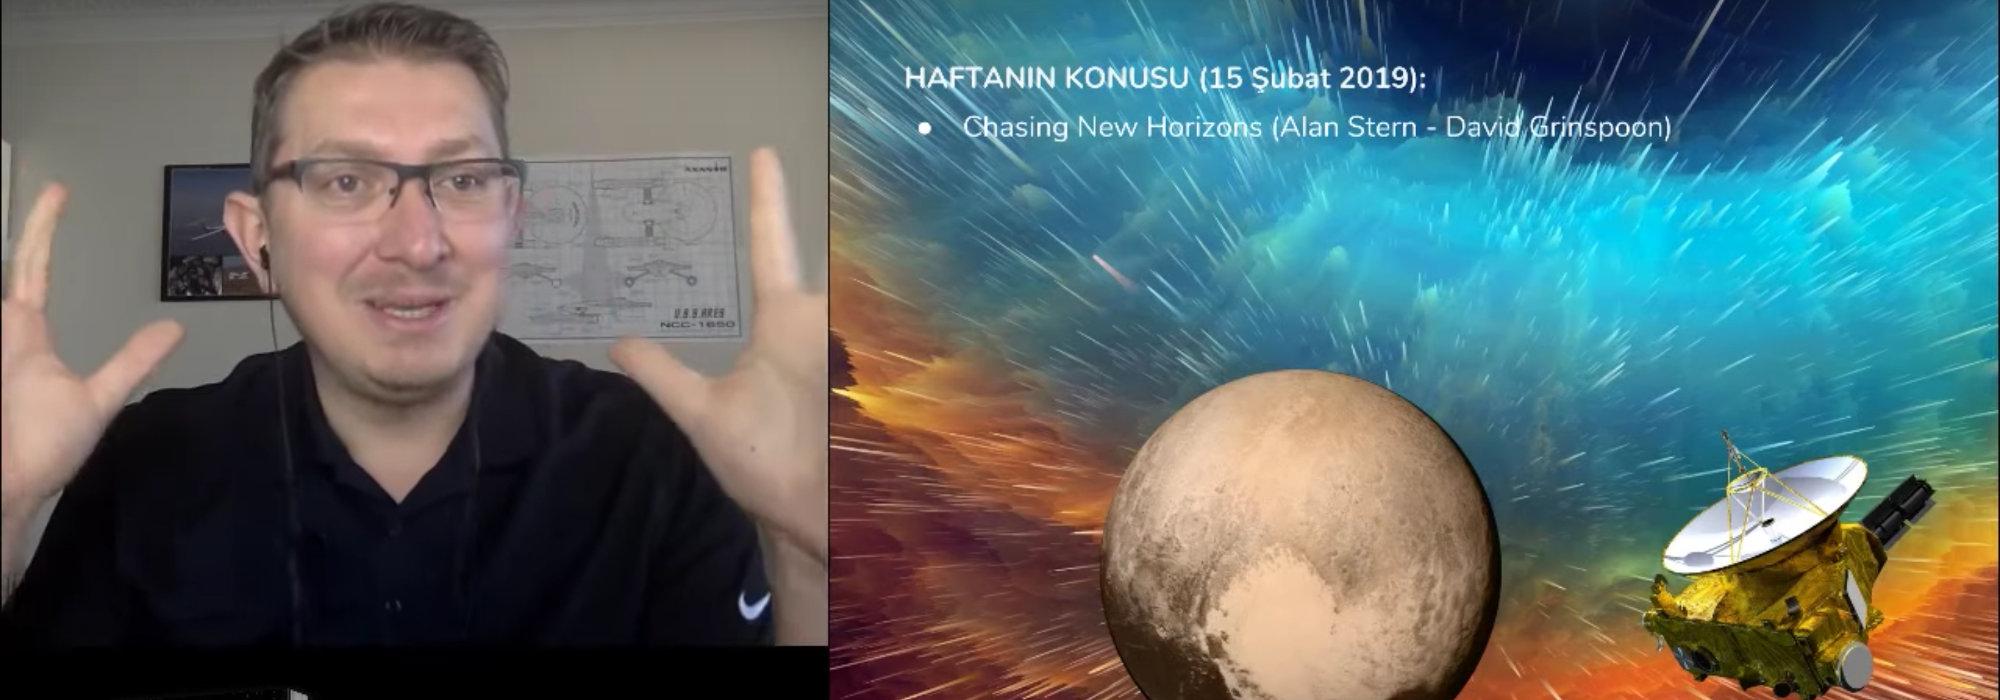 Kitap Kulübü | New Horizons Misyonu – Alan Stern